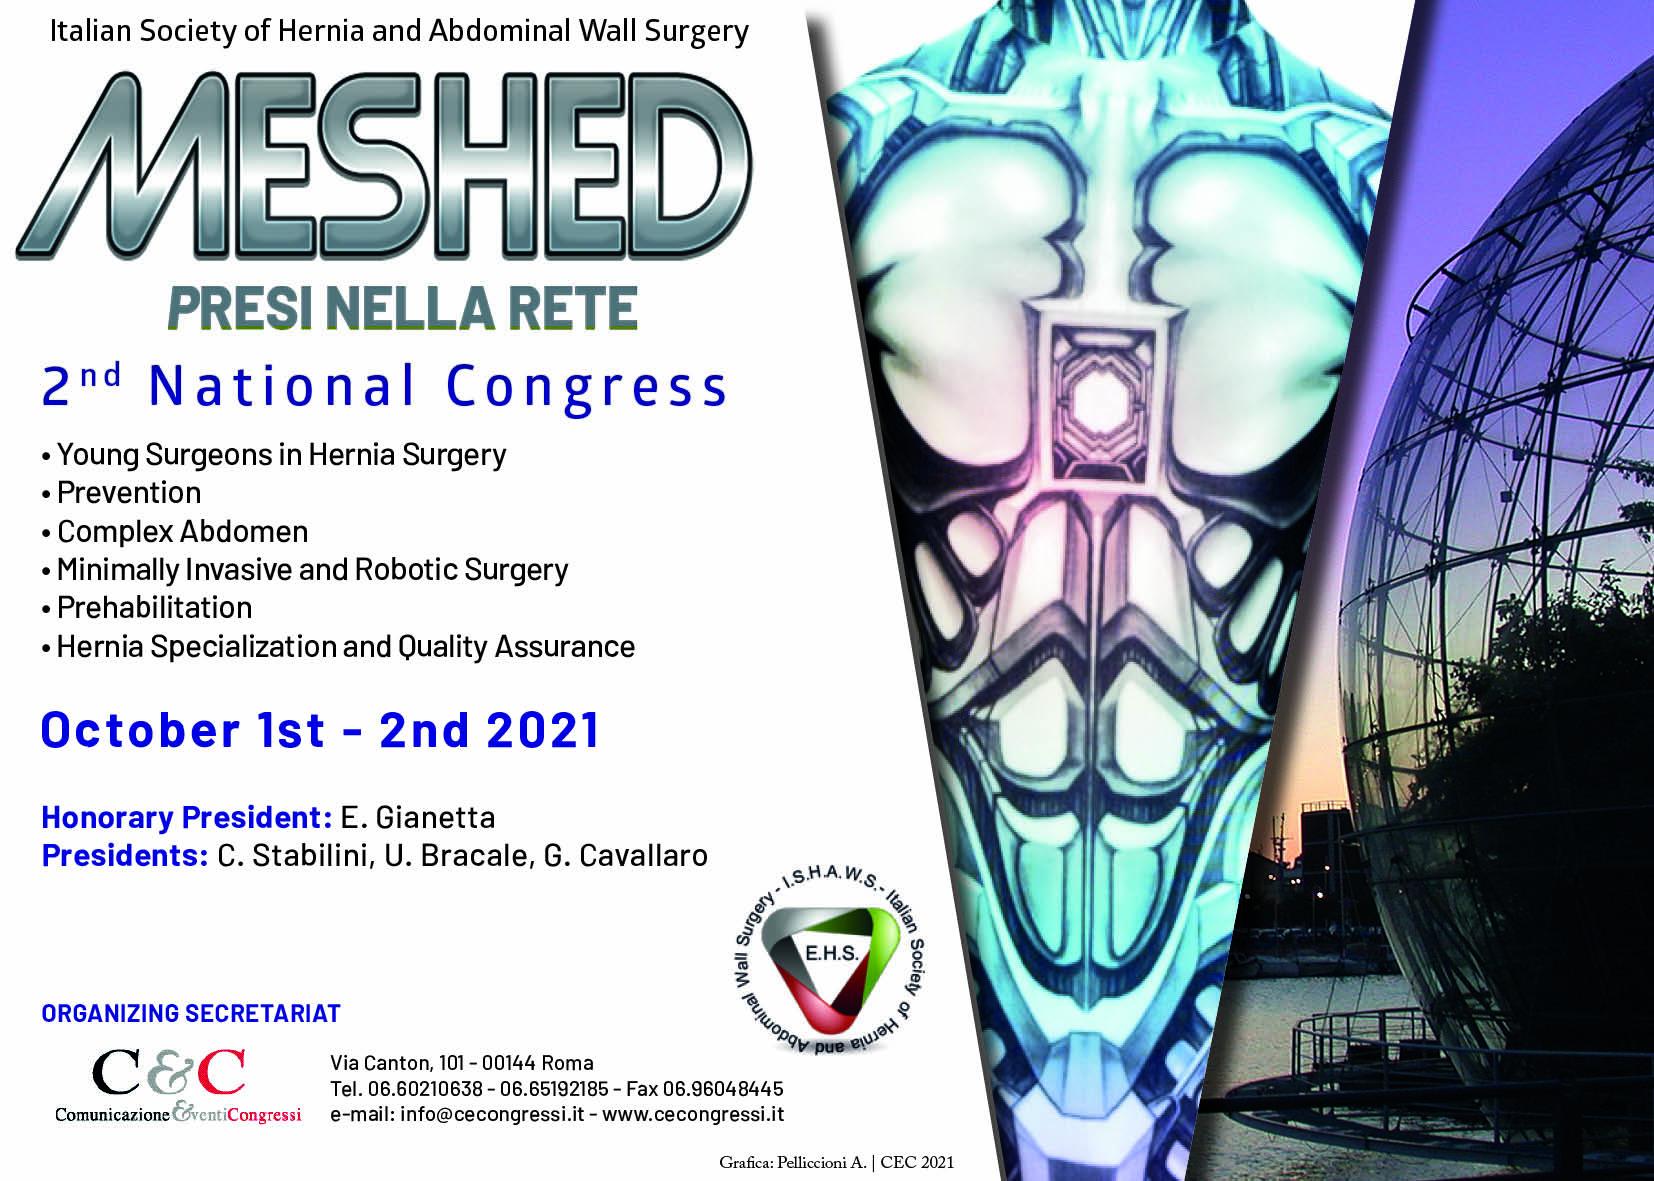 MESHED - PRESI NELLA RETE  | OCTOBER 1st - 2nd 2021